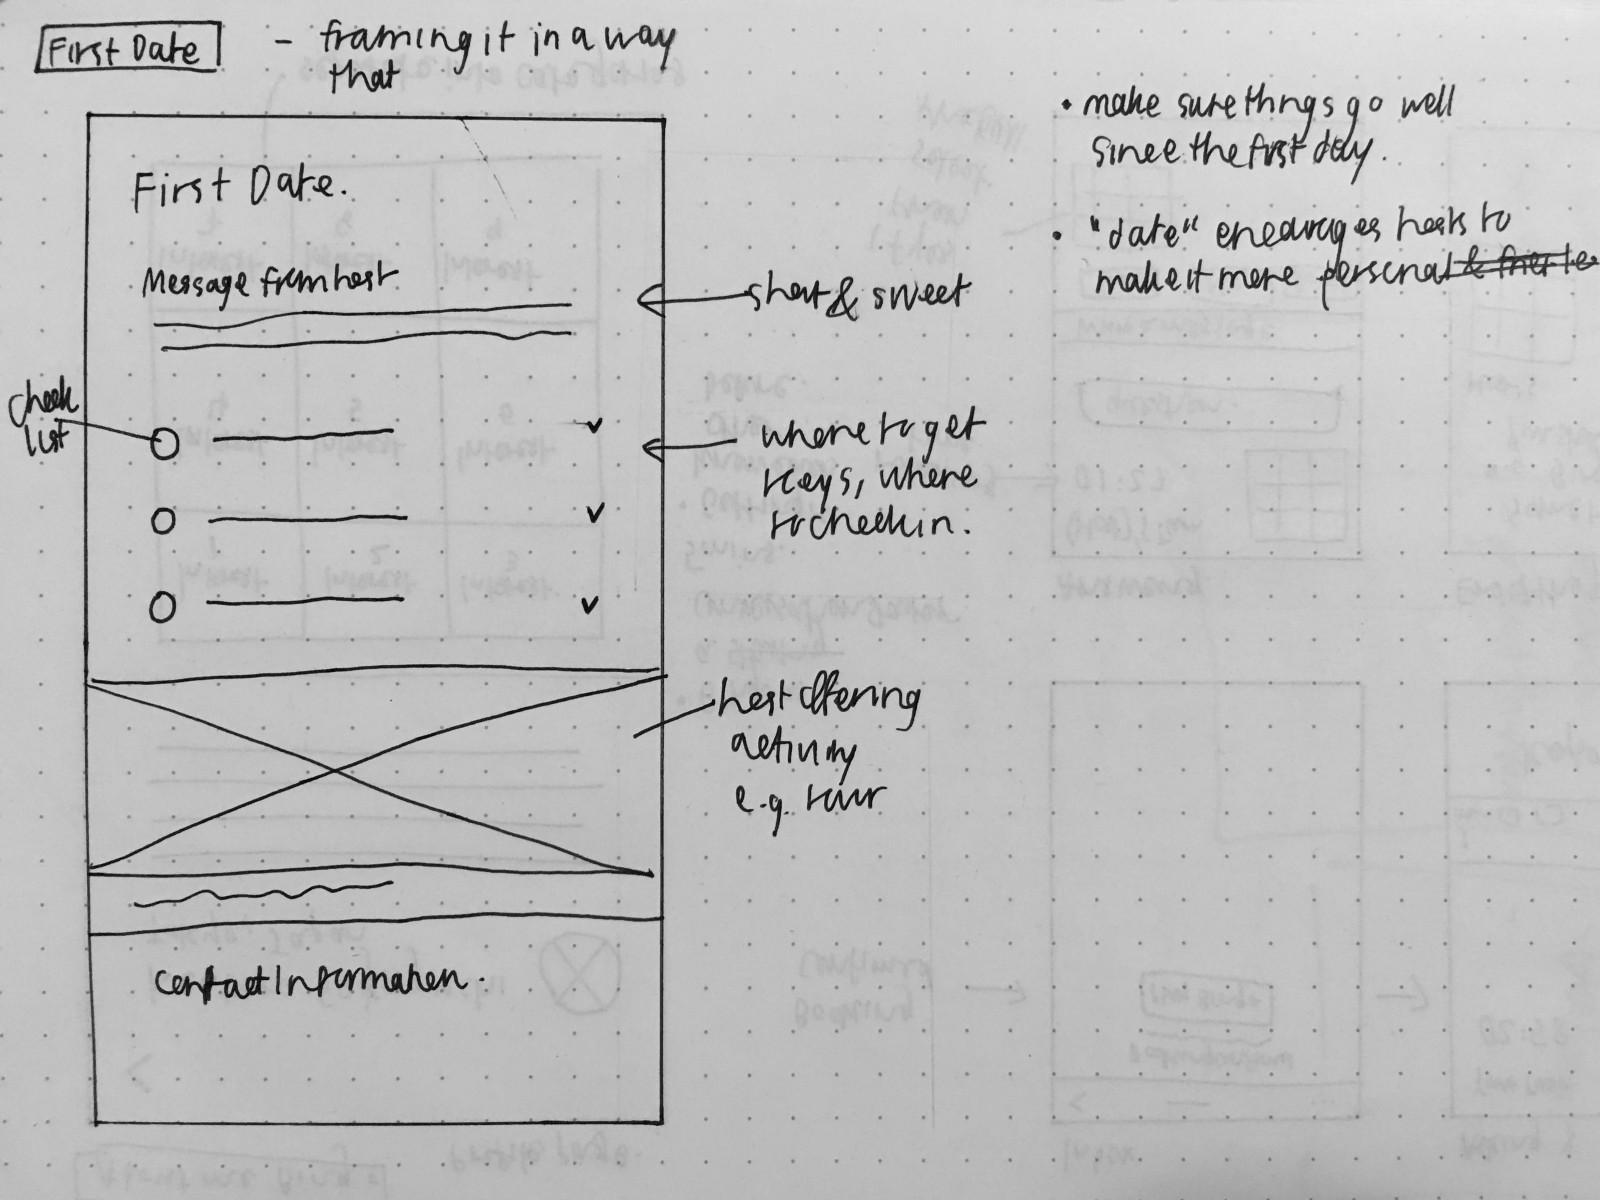 Digital Gift Exchange Concept Low-Fidelity Sketch